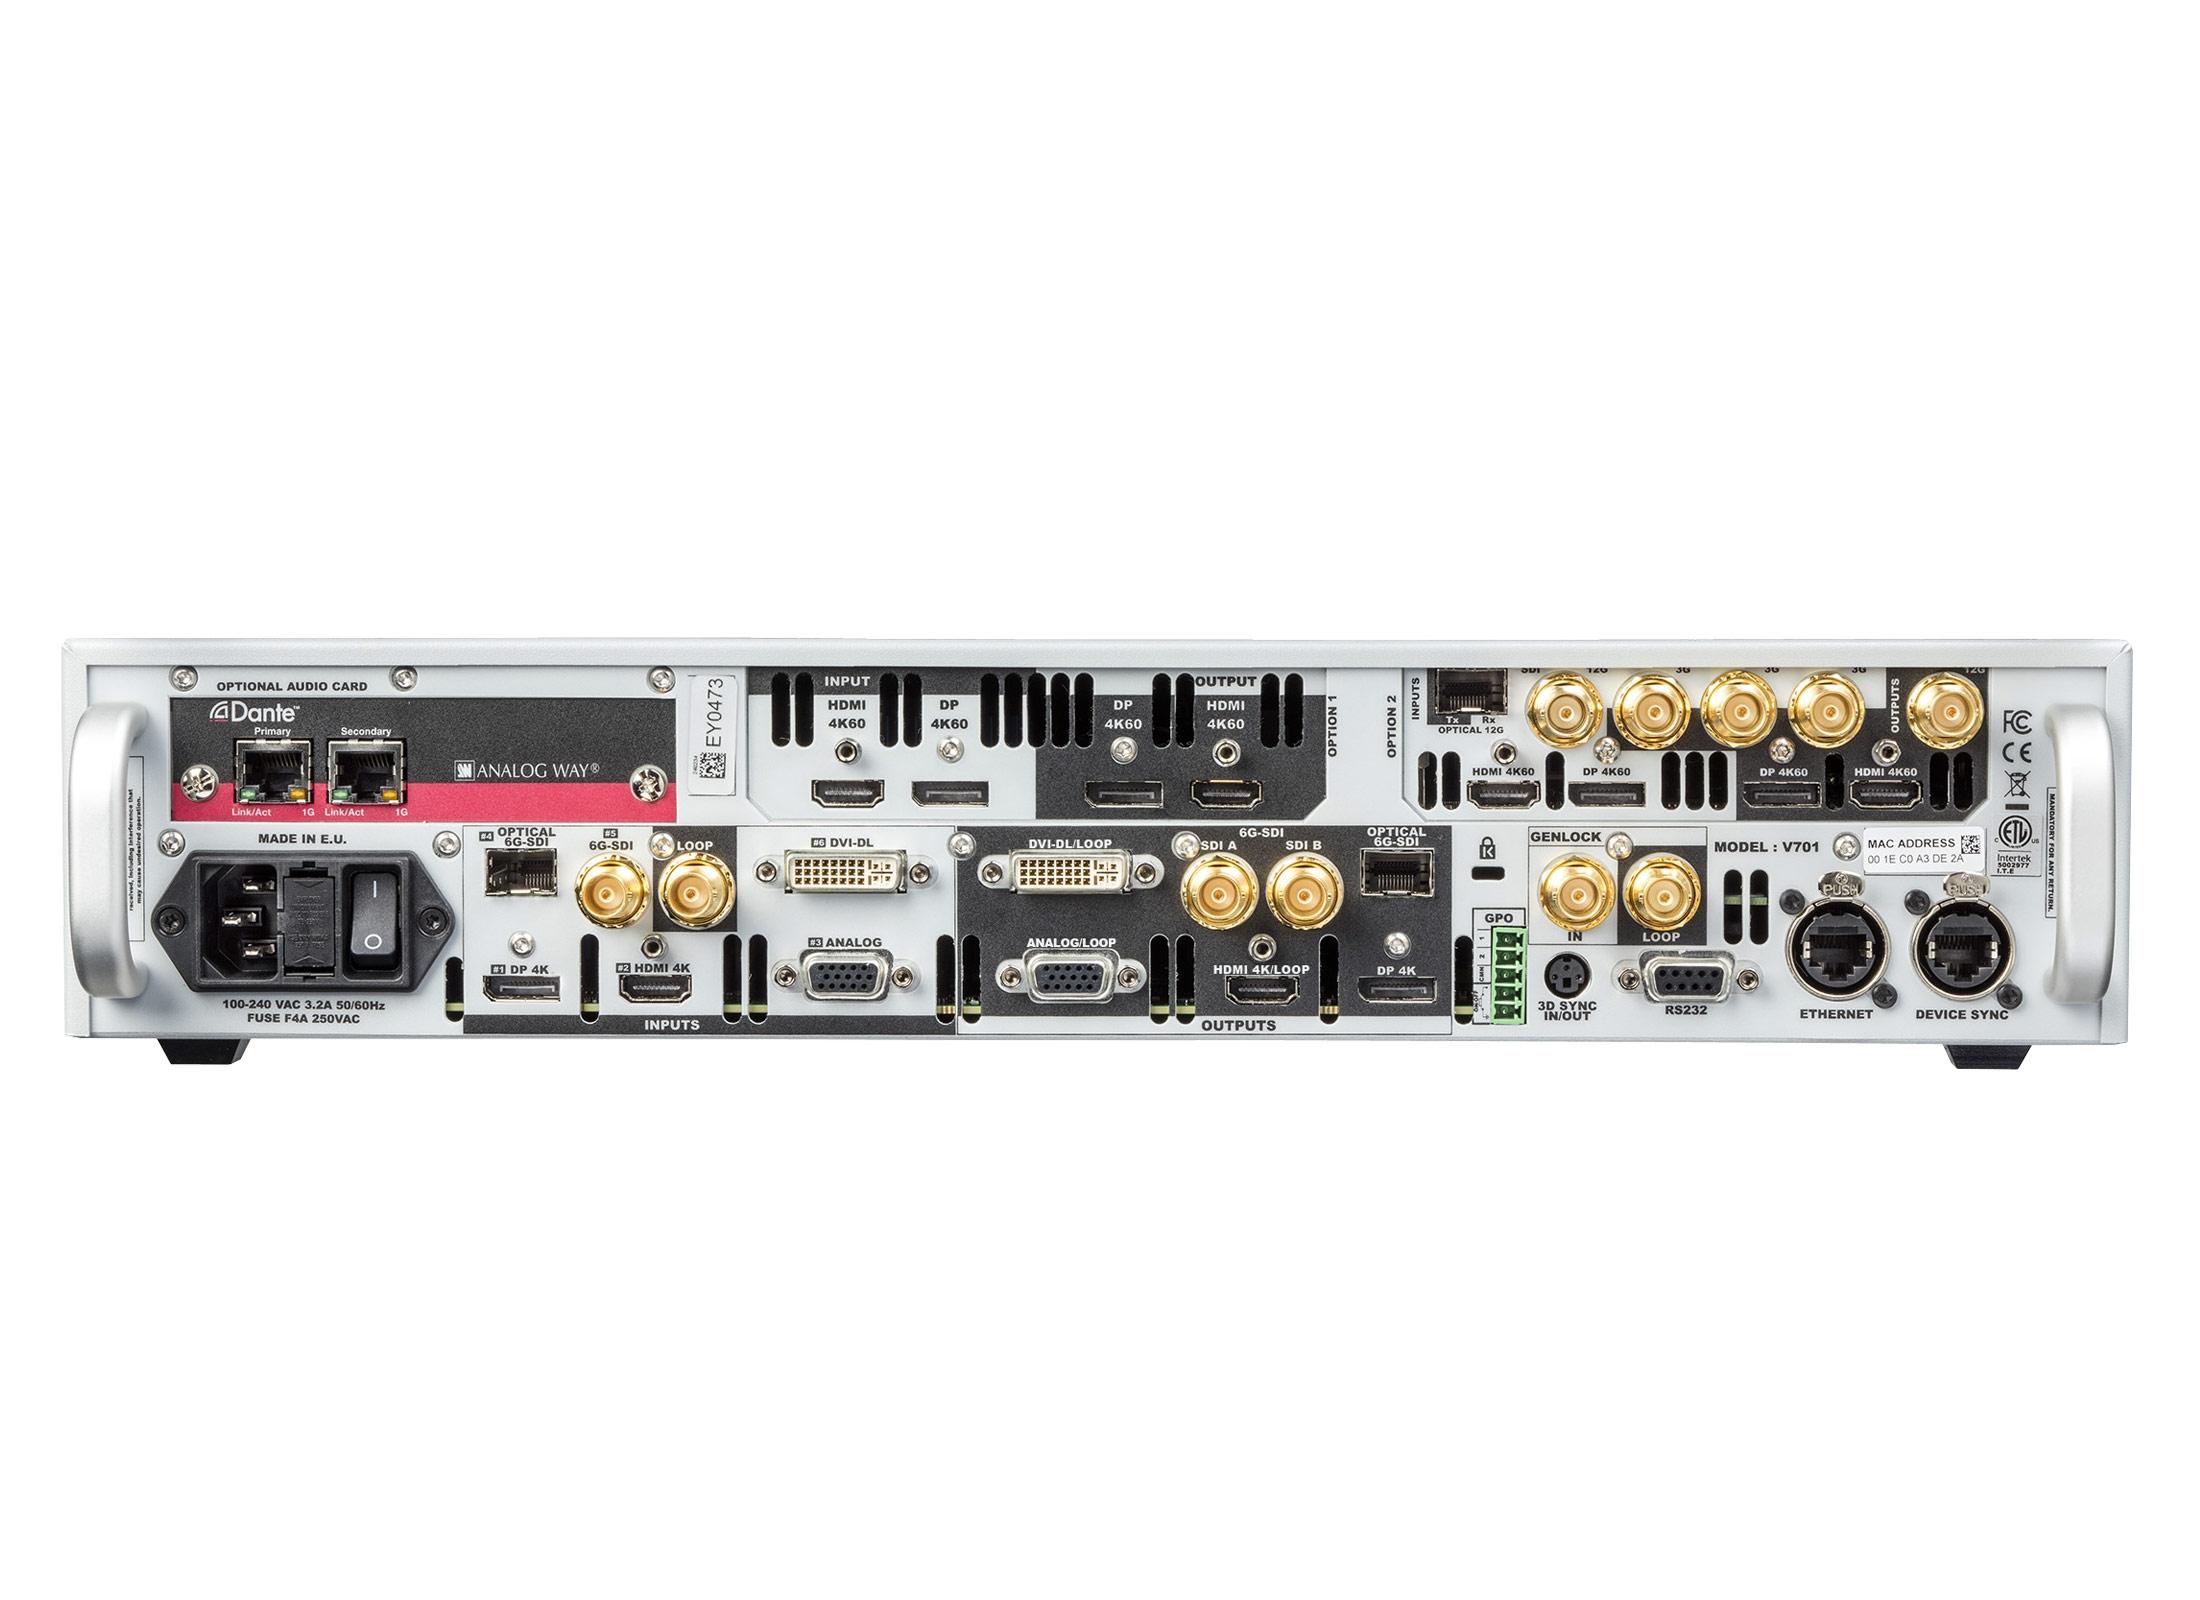 Analog Way Vio 4k V701 Video Processing Tool Box Set Gnstig Online 3 Switch 2